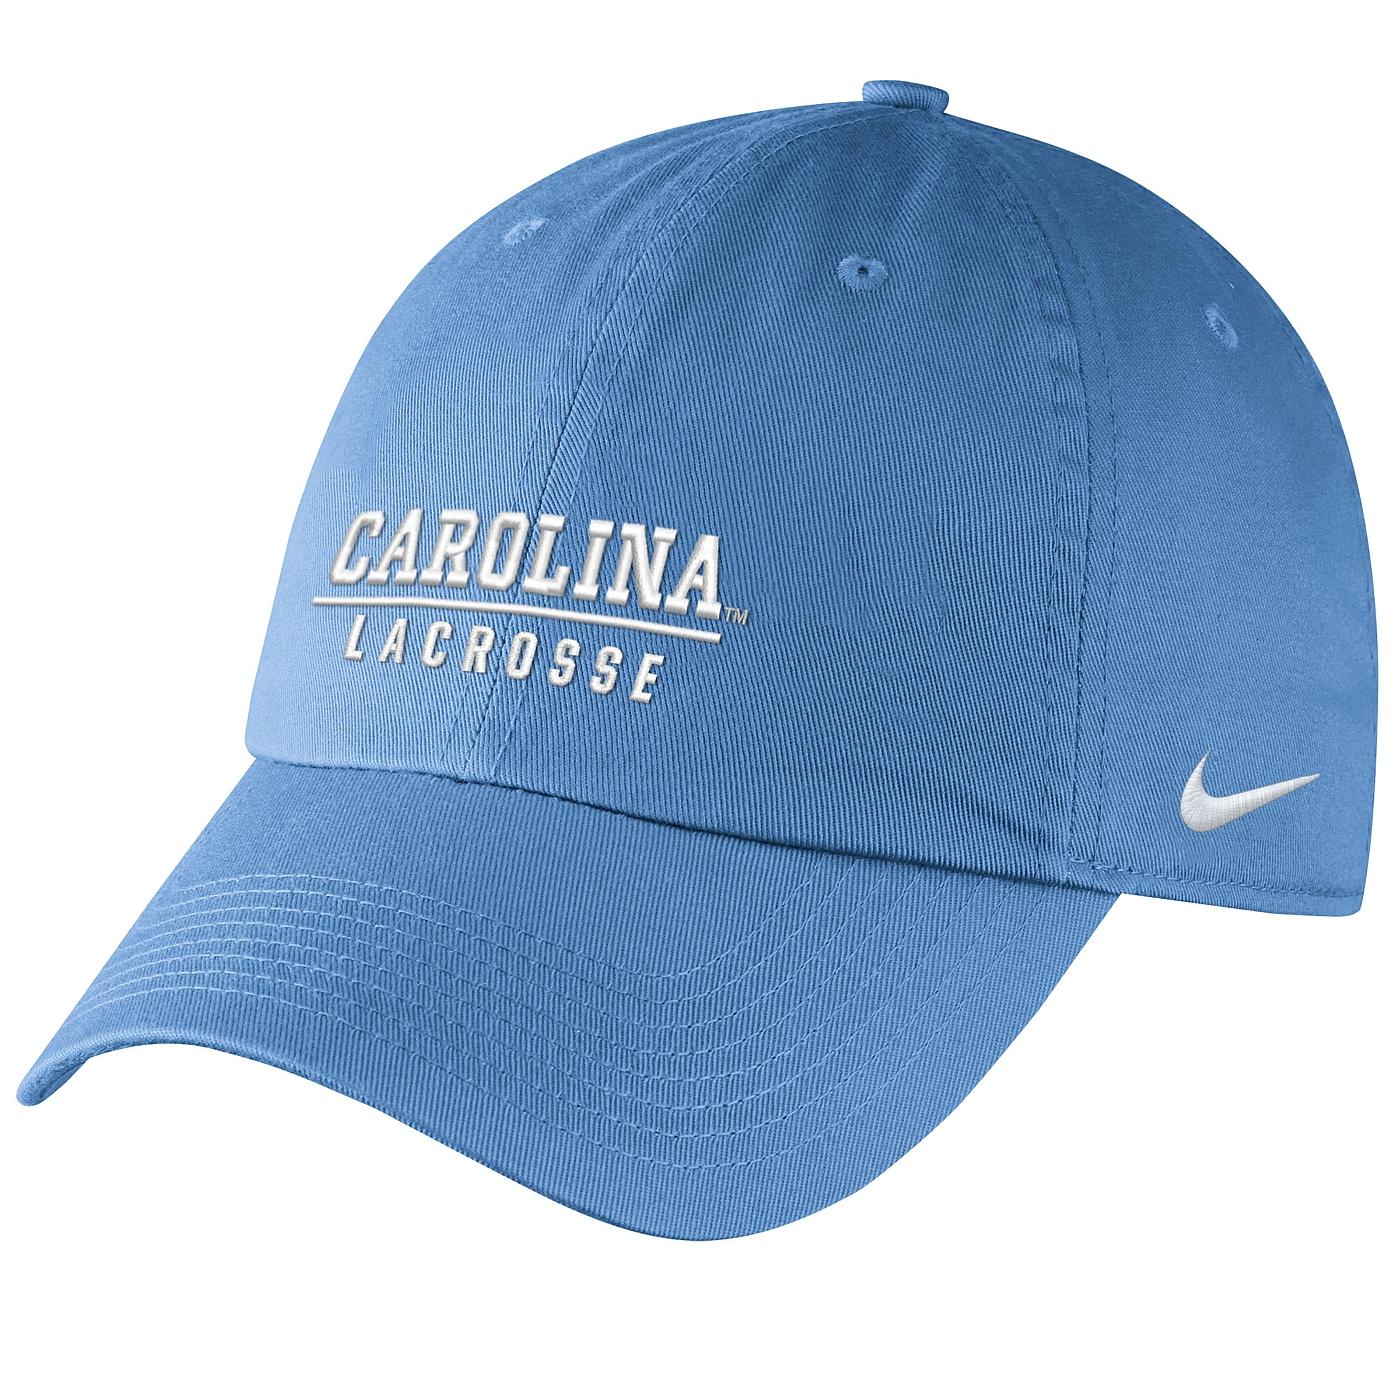 b13a233e930 Johnny T-shirt - North Carolina Tar Heels - Nike Lacrosse Wordmark Campus  Hat (CB) by Nike